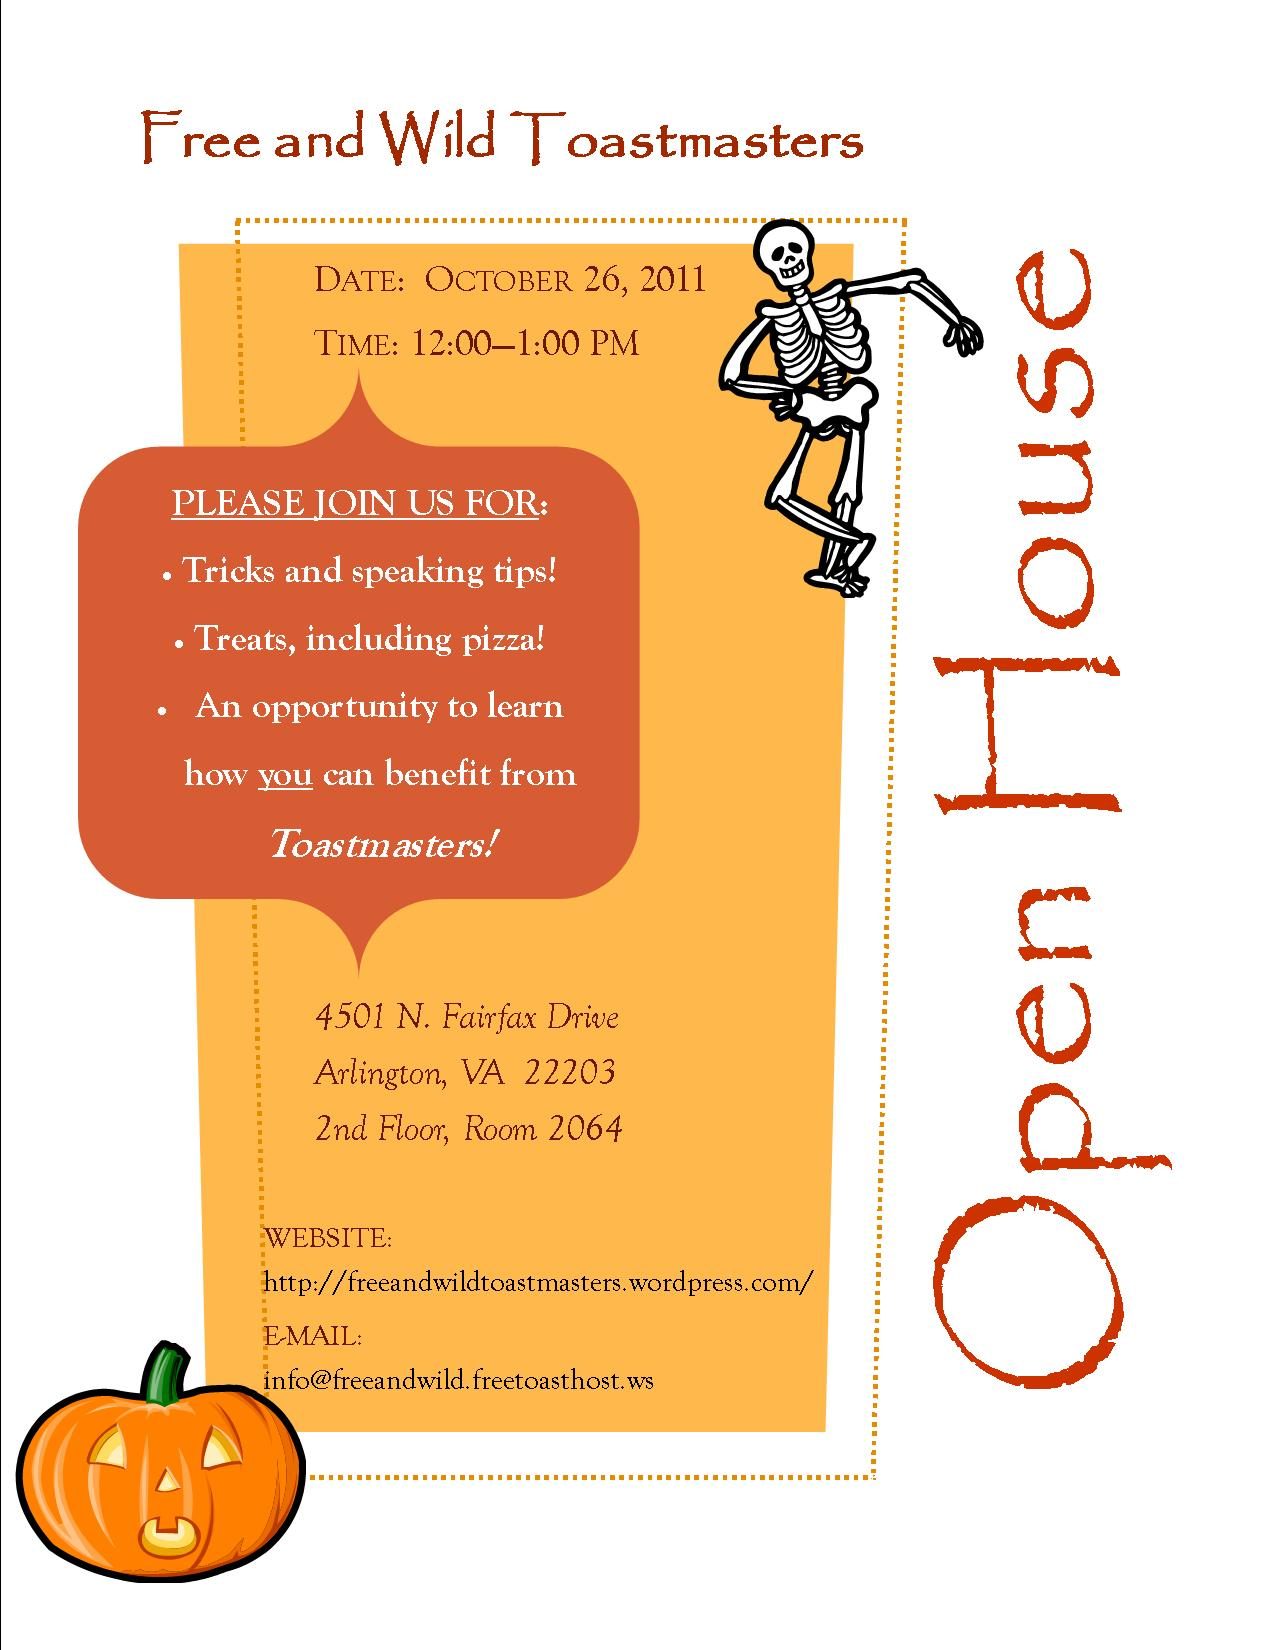 Free Open House Flyers open house flyer template free aqus news – Free Open House Flyers